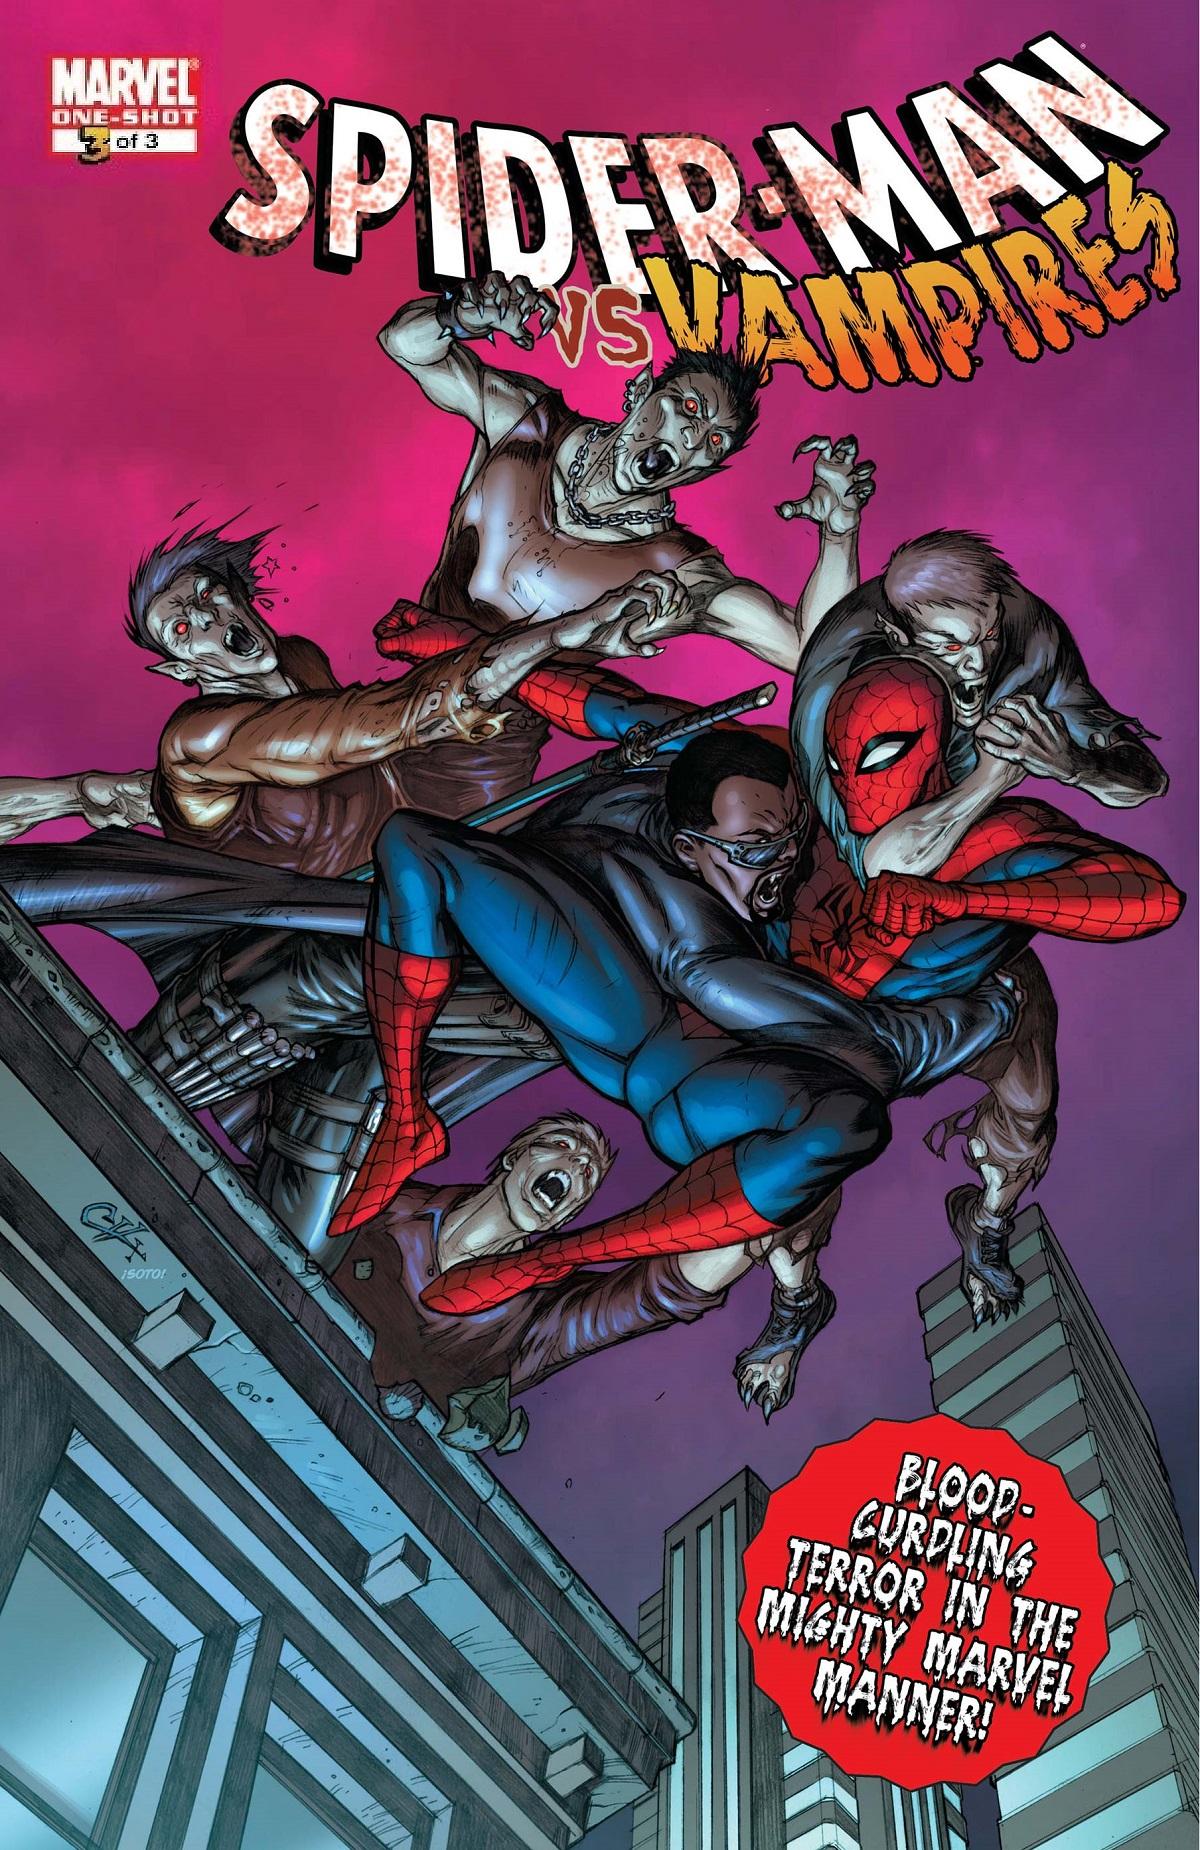 Spider-Man Vs. Vampires Digital Comic (2010) #3